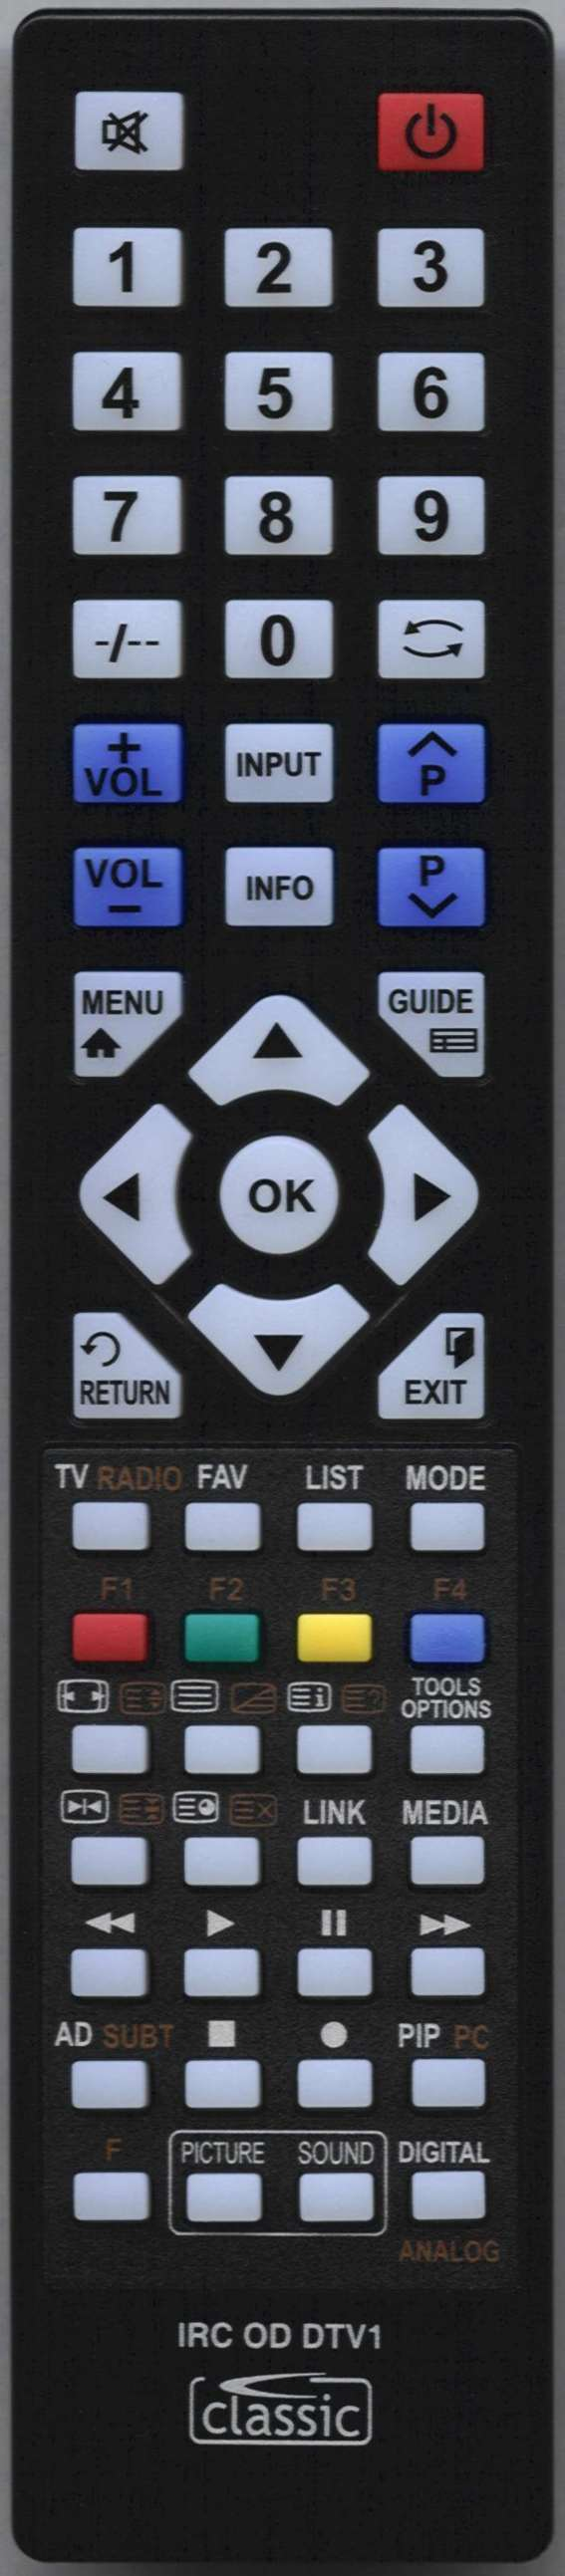 AKURA ABK202 Remote Control